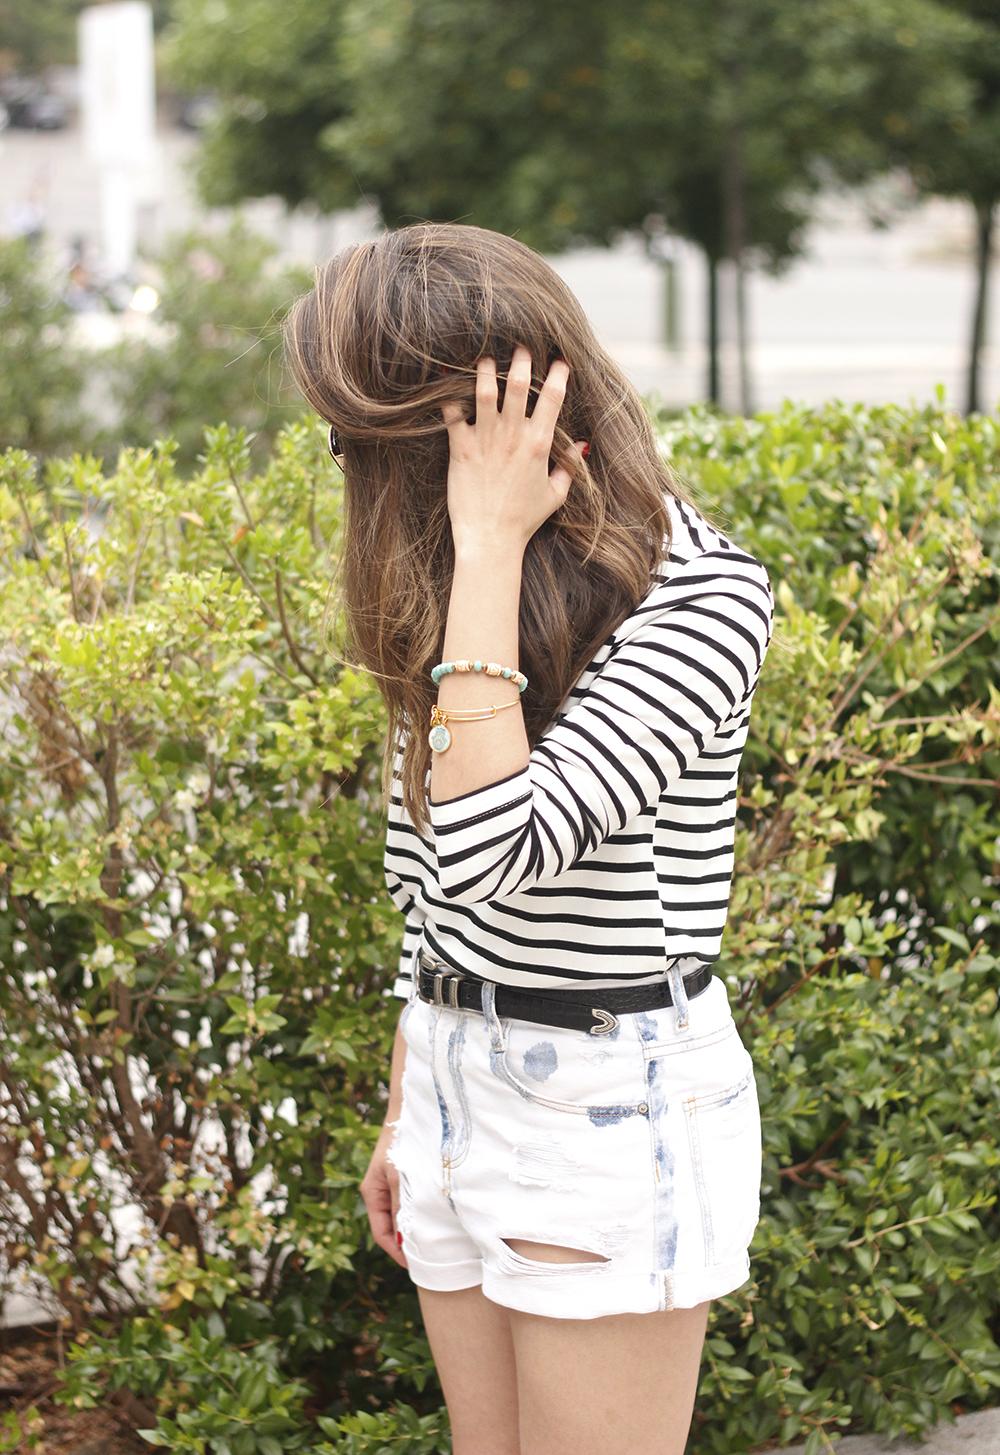 Stripes and denim shorts nude heels acosta bag sunnies belt summer outfit18